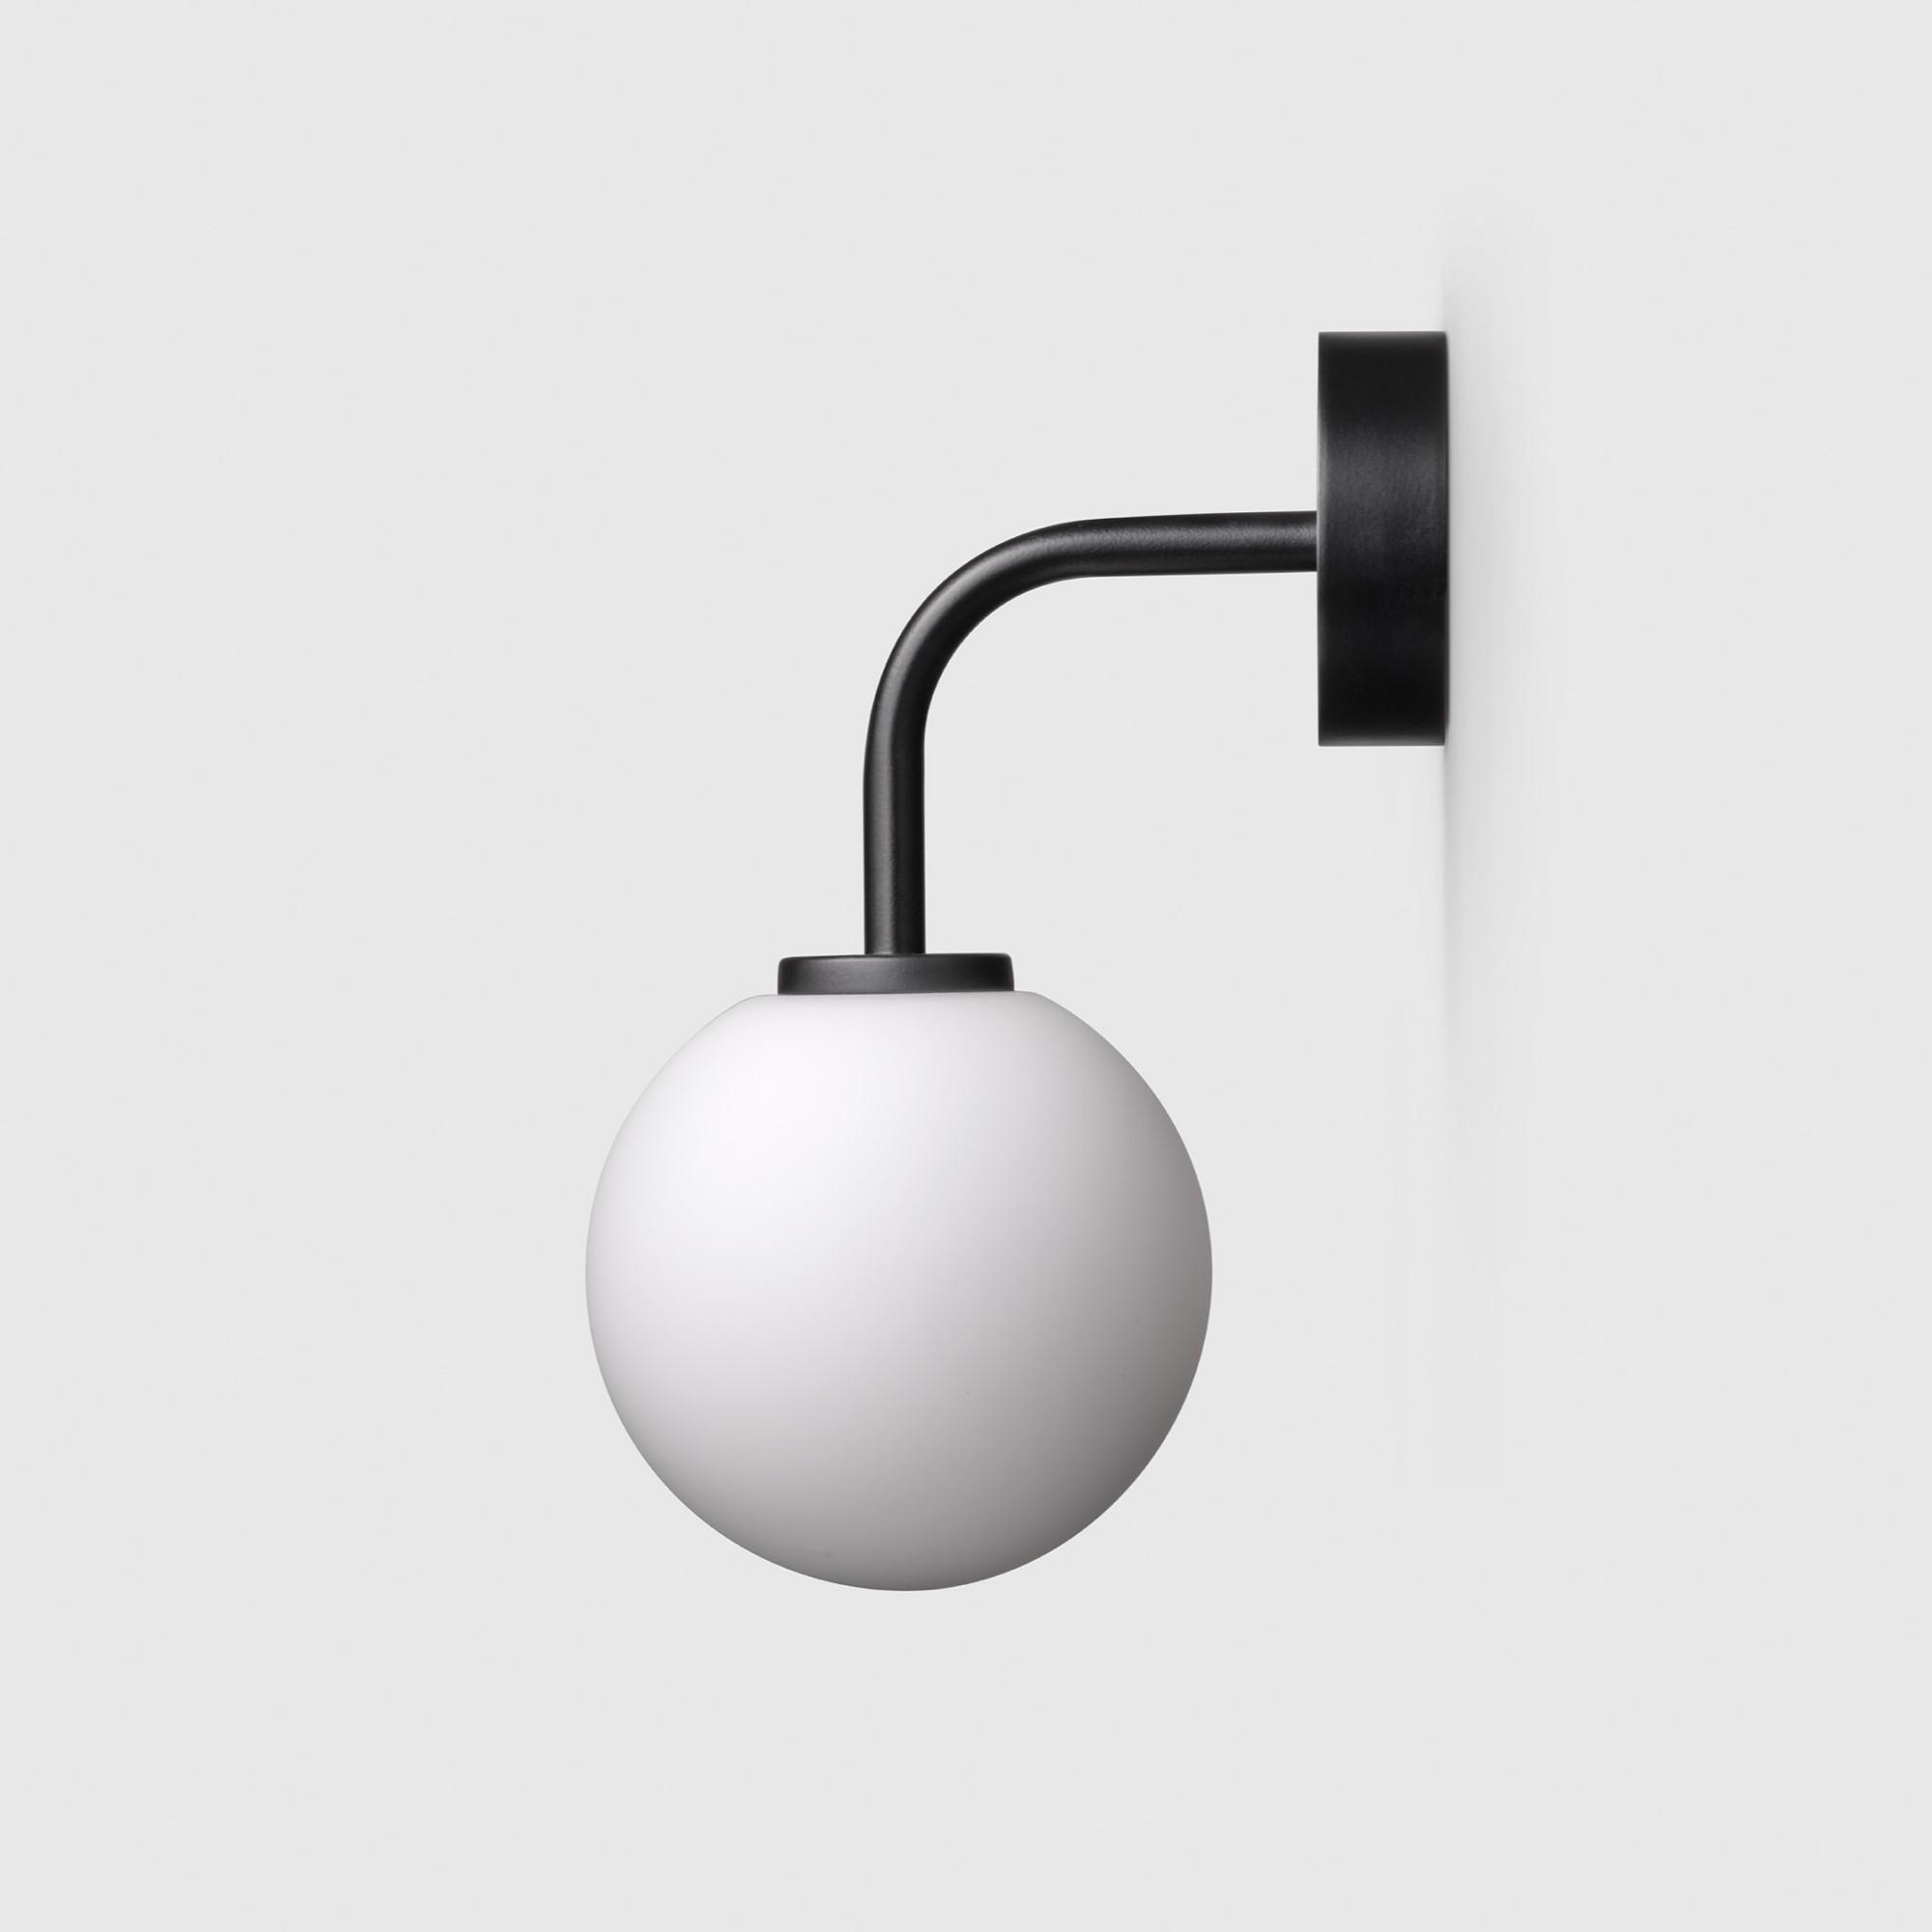 Vägglampa Haven Lamp L2.03